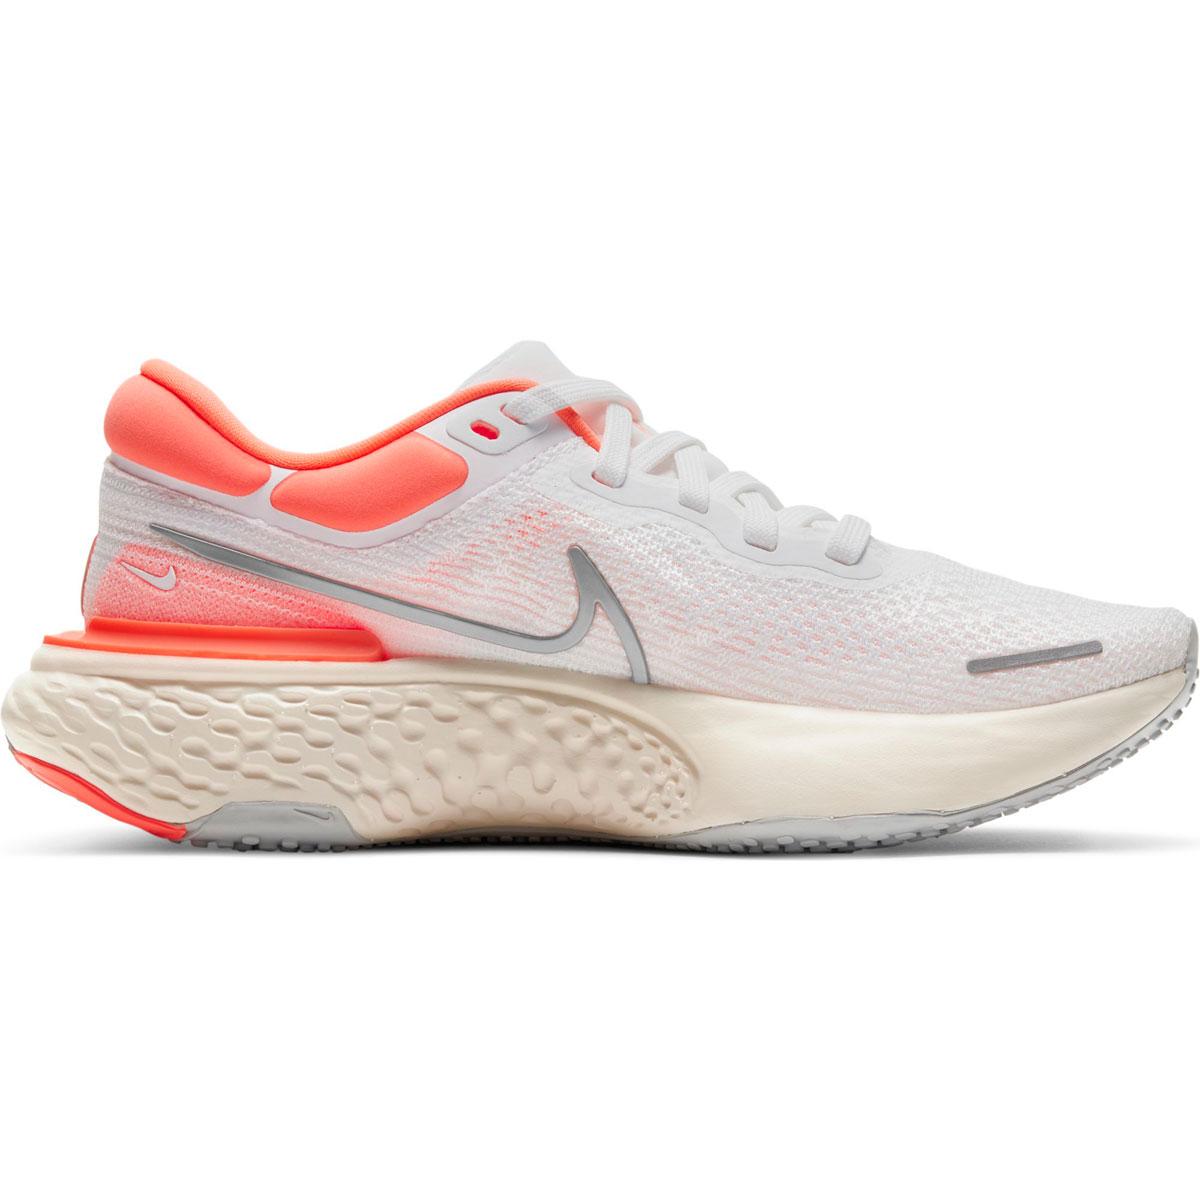 Women's Nike Zoomx Invincible Run FlyKnit Running Shoe - Color: White/Metallic Silver/Bright Mango - Size: 5 - Width: Regular, White/Metallic Silver/Bright Mango, large, image 1